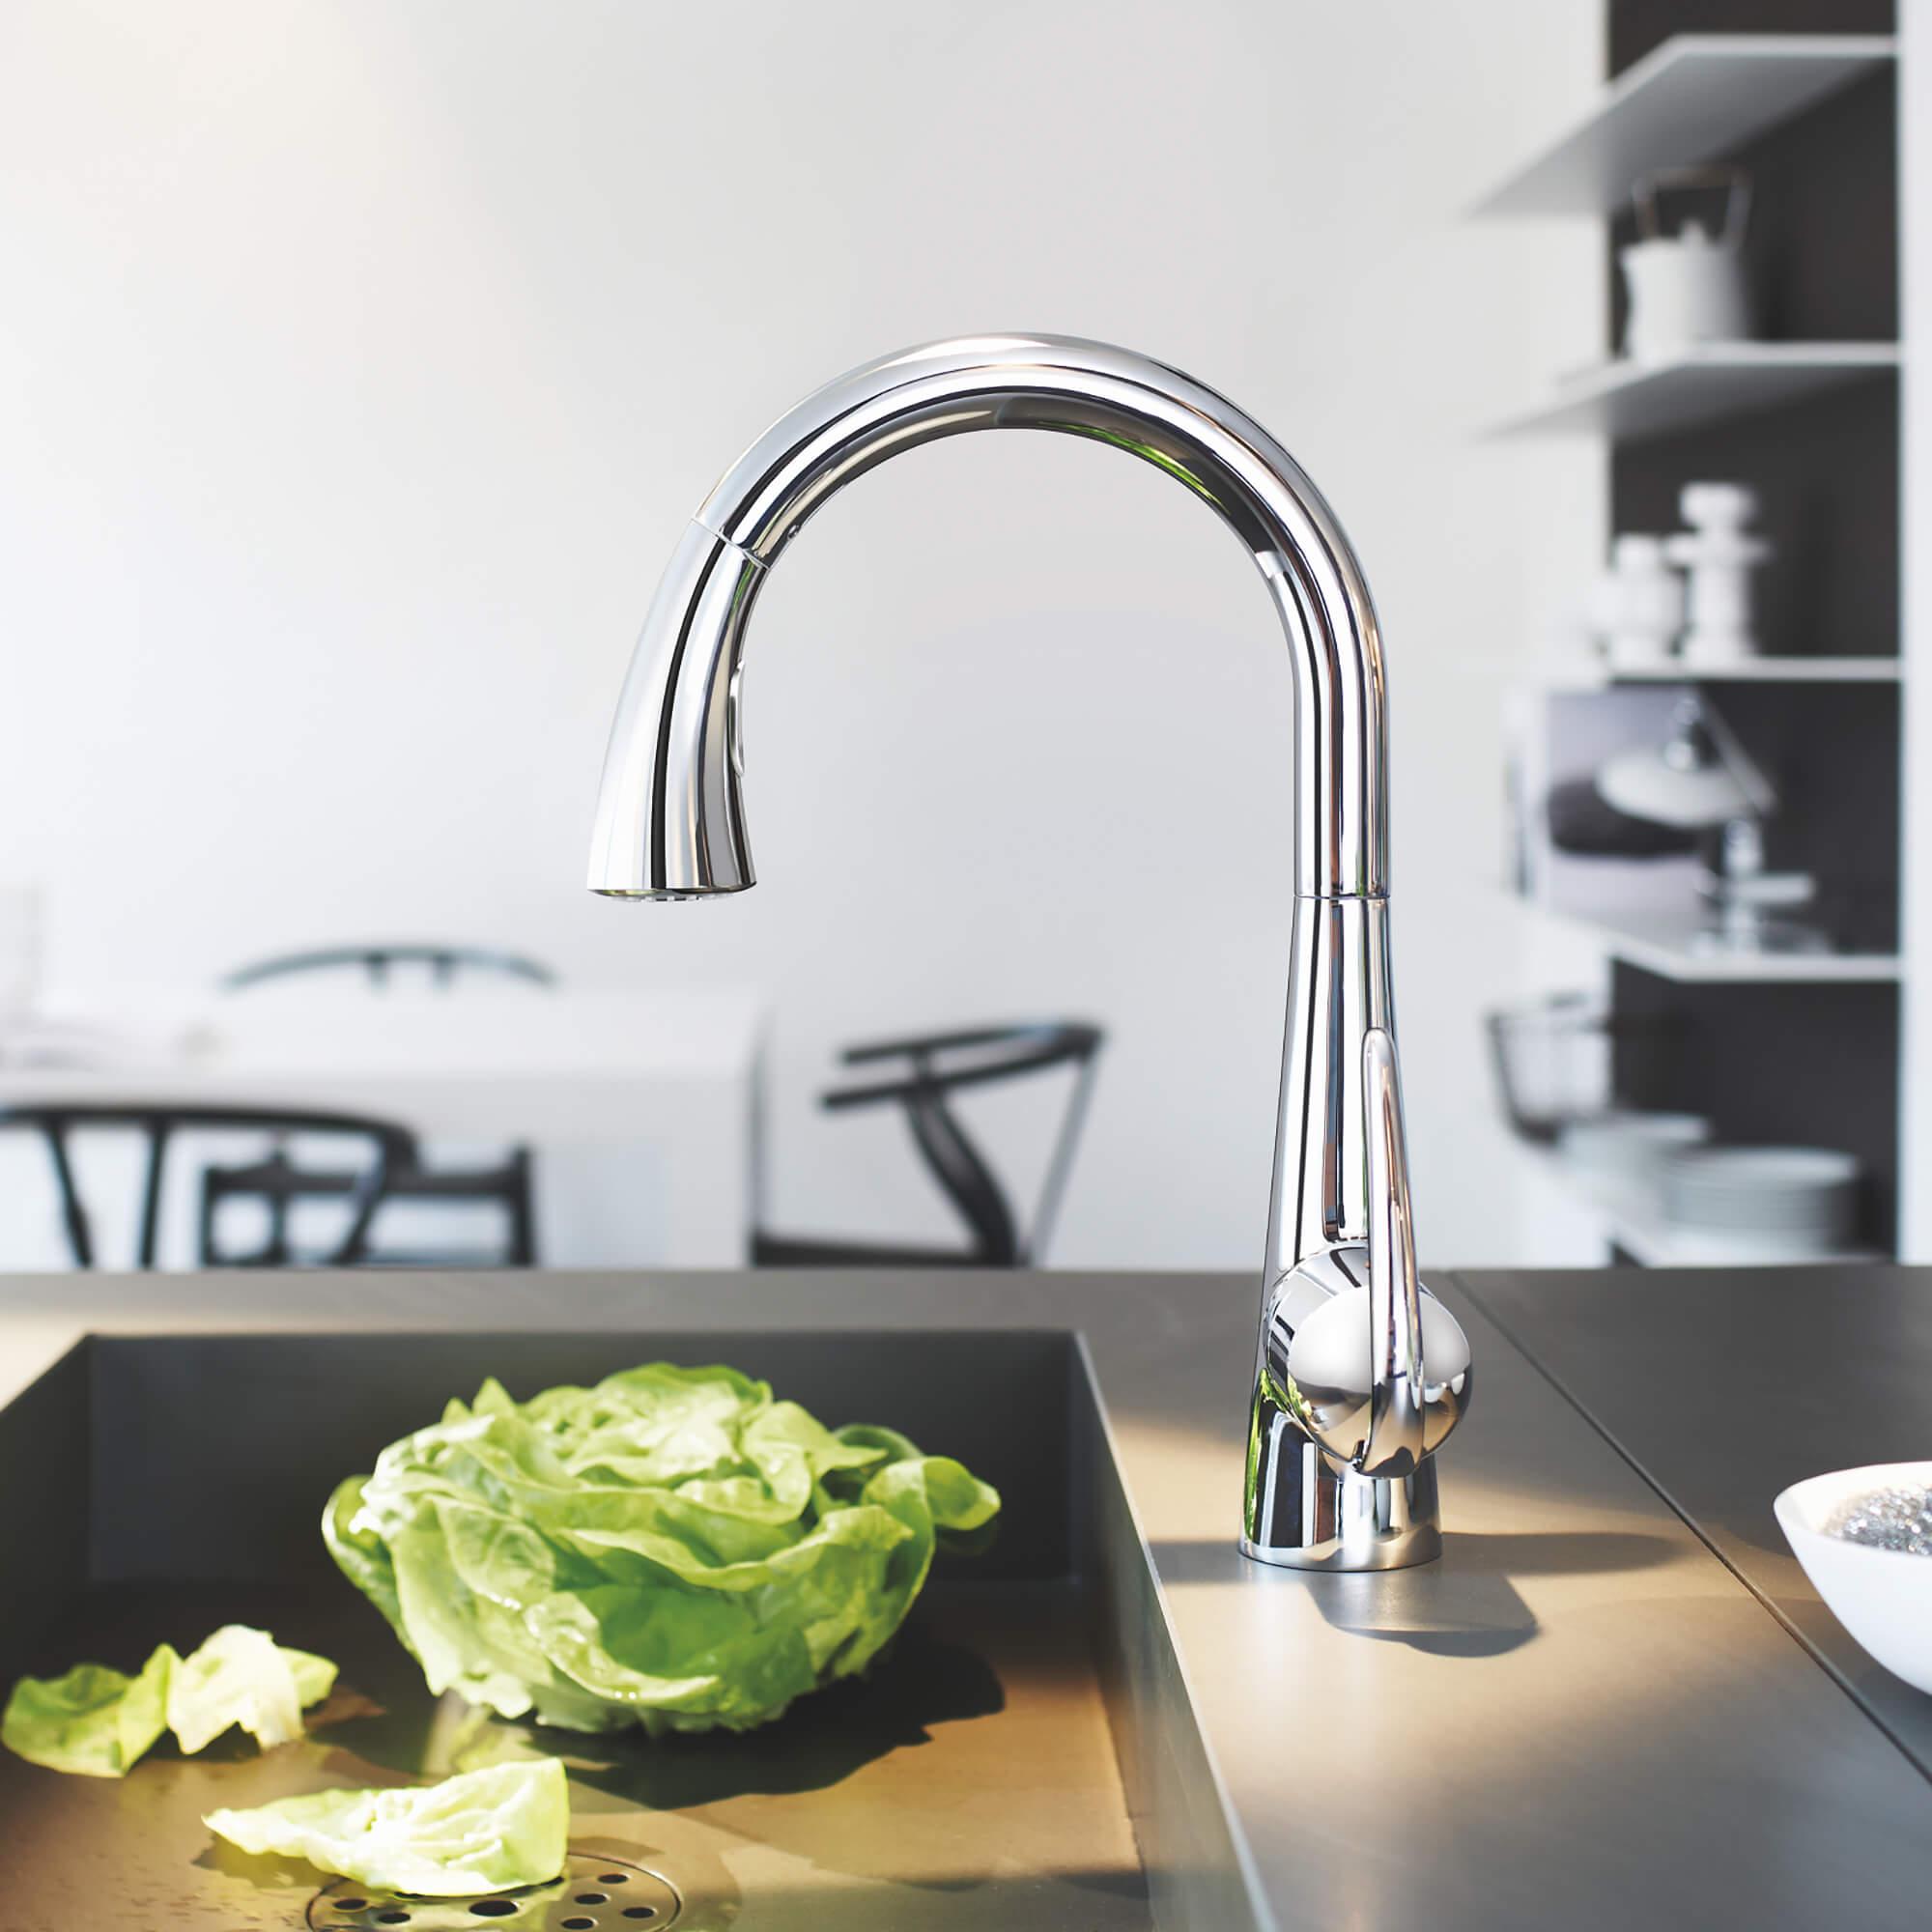 LadyLux3 Faucet in Kitchen